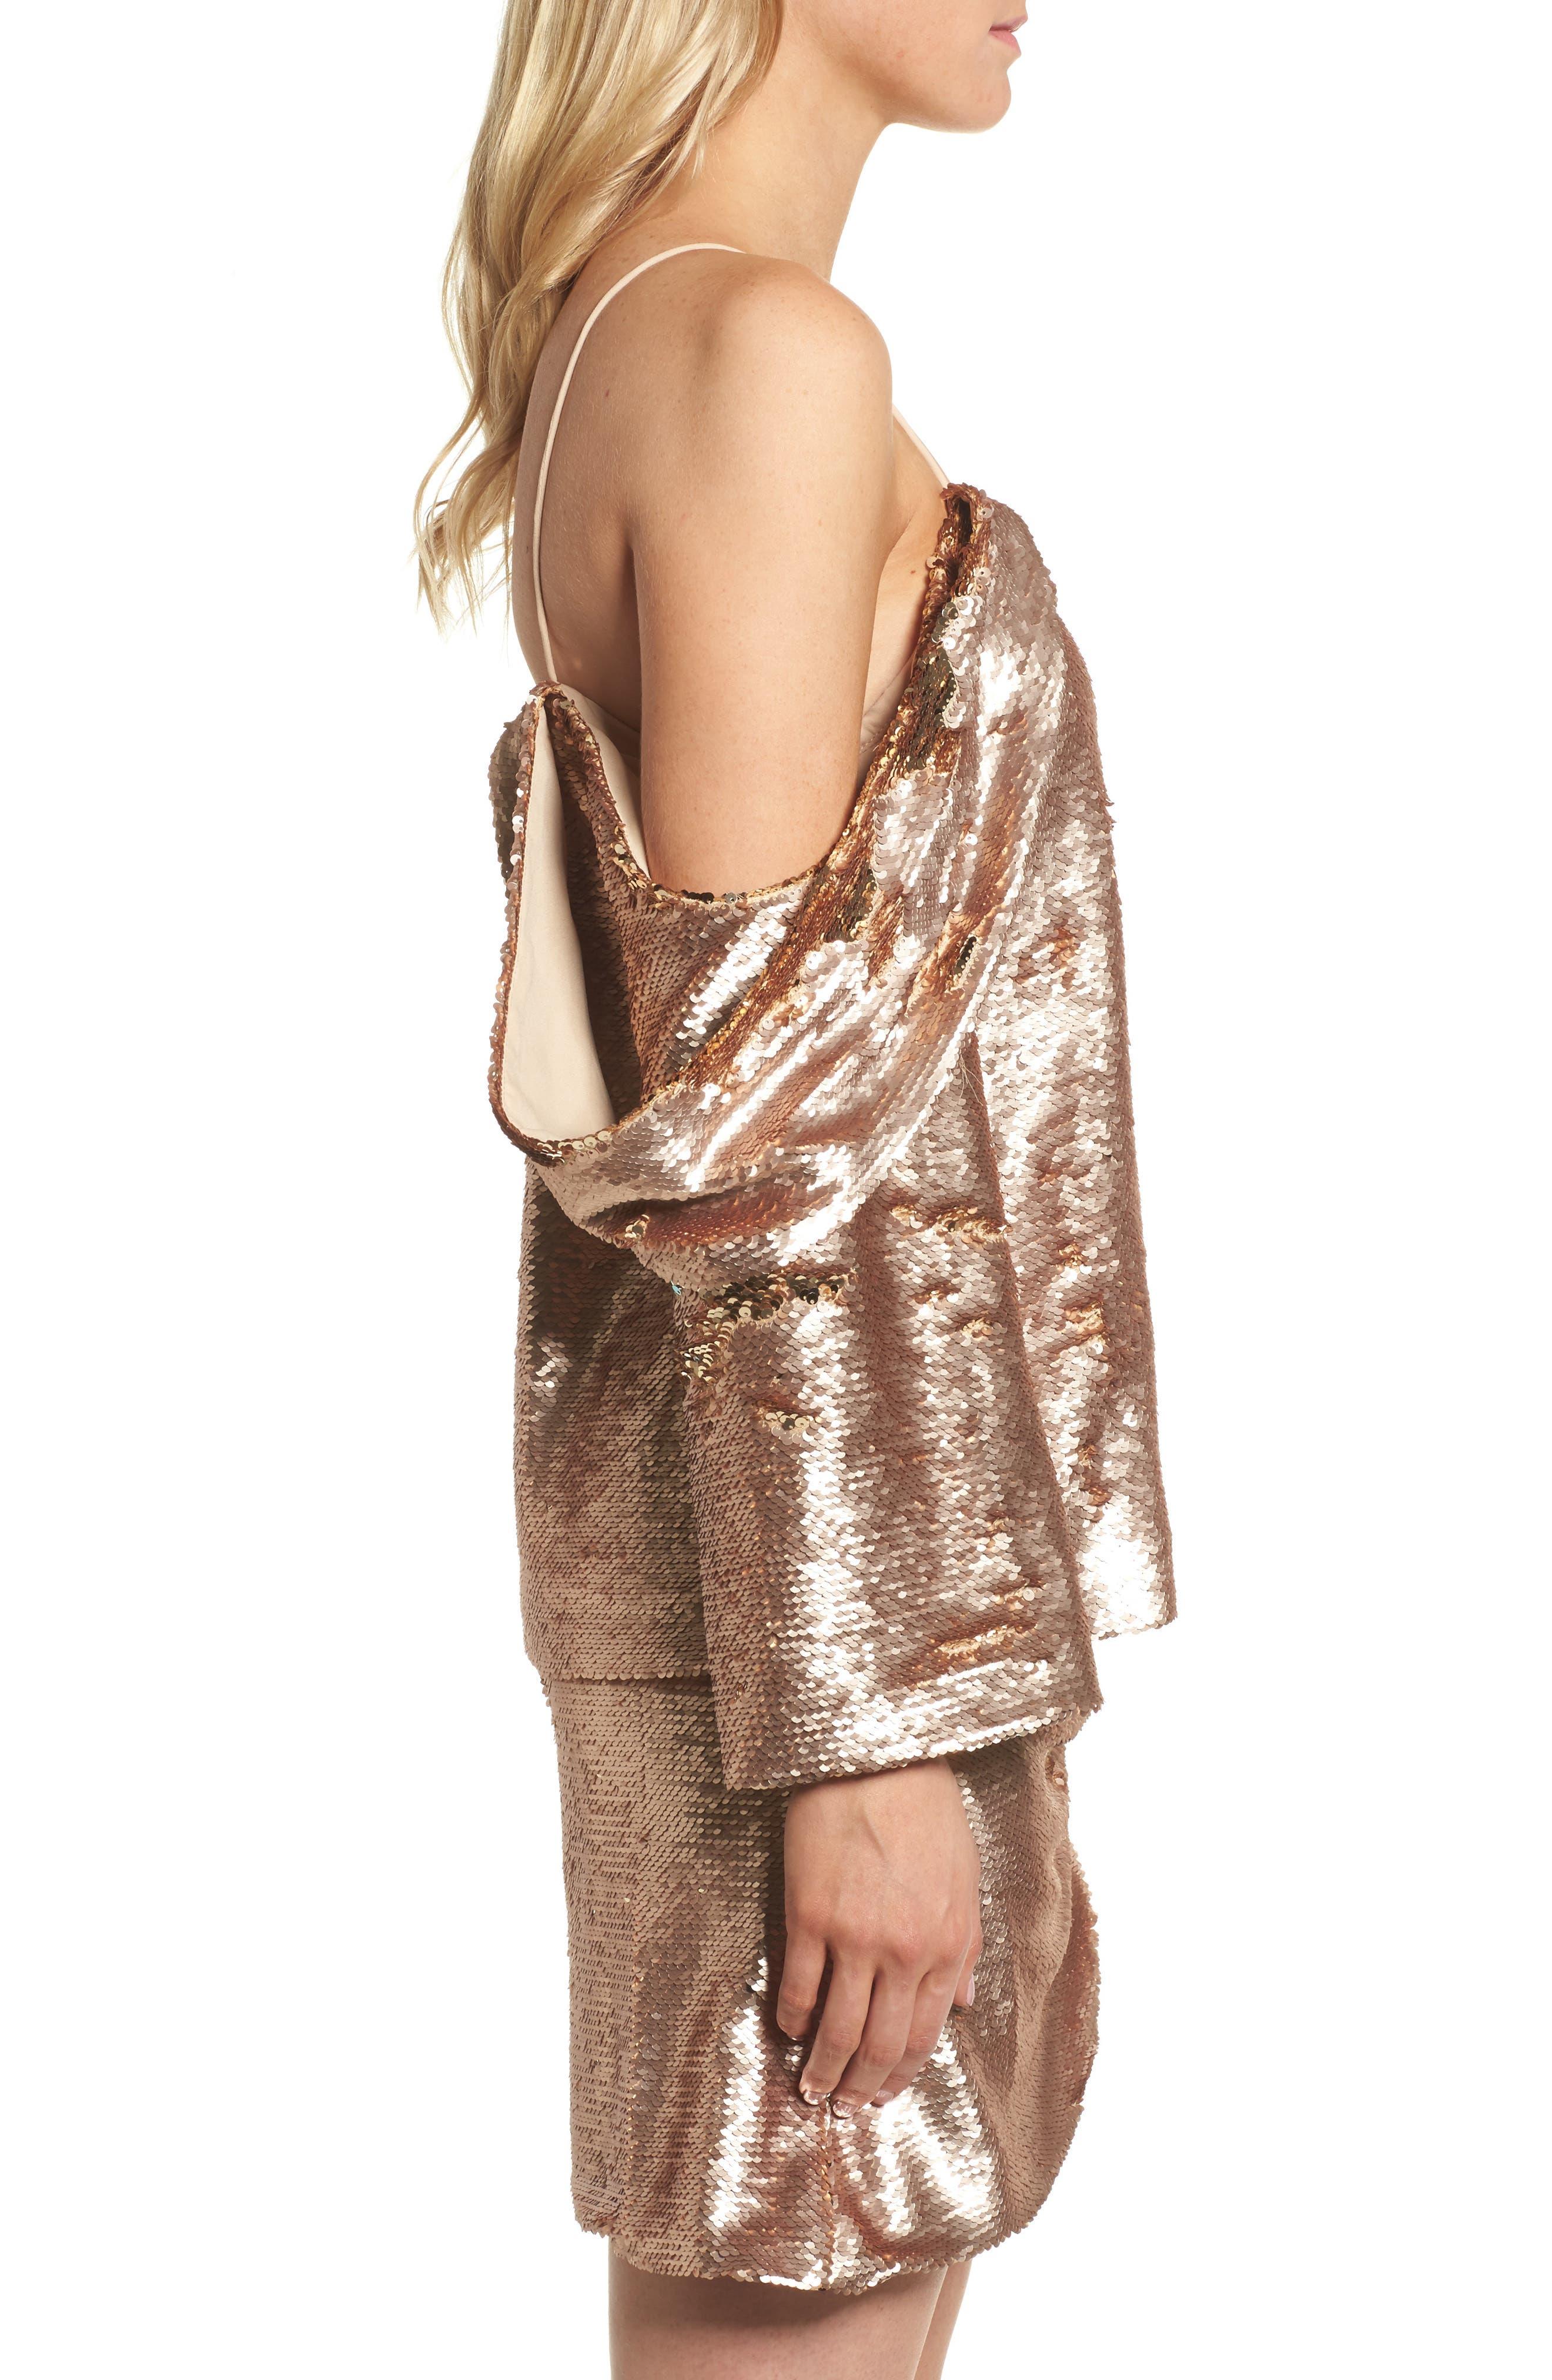 Revolution Off the Shoulder Sequin Top,                             Alternate thumbnail 3, color,                             Champagne Blush